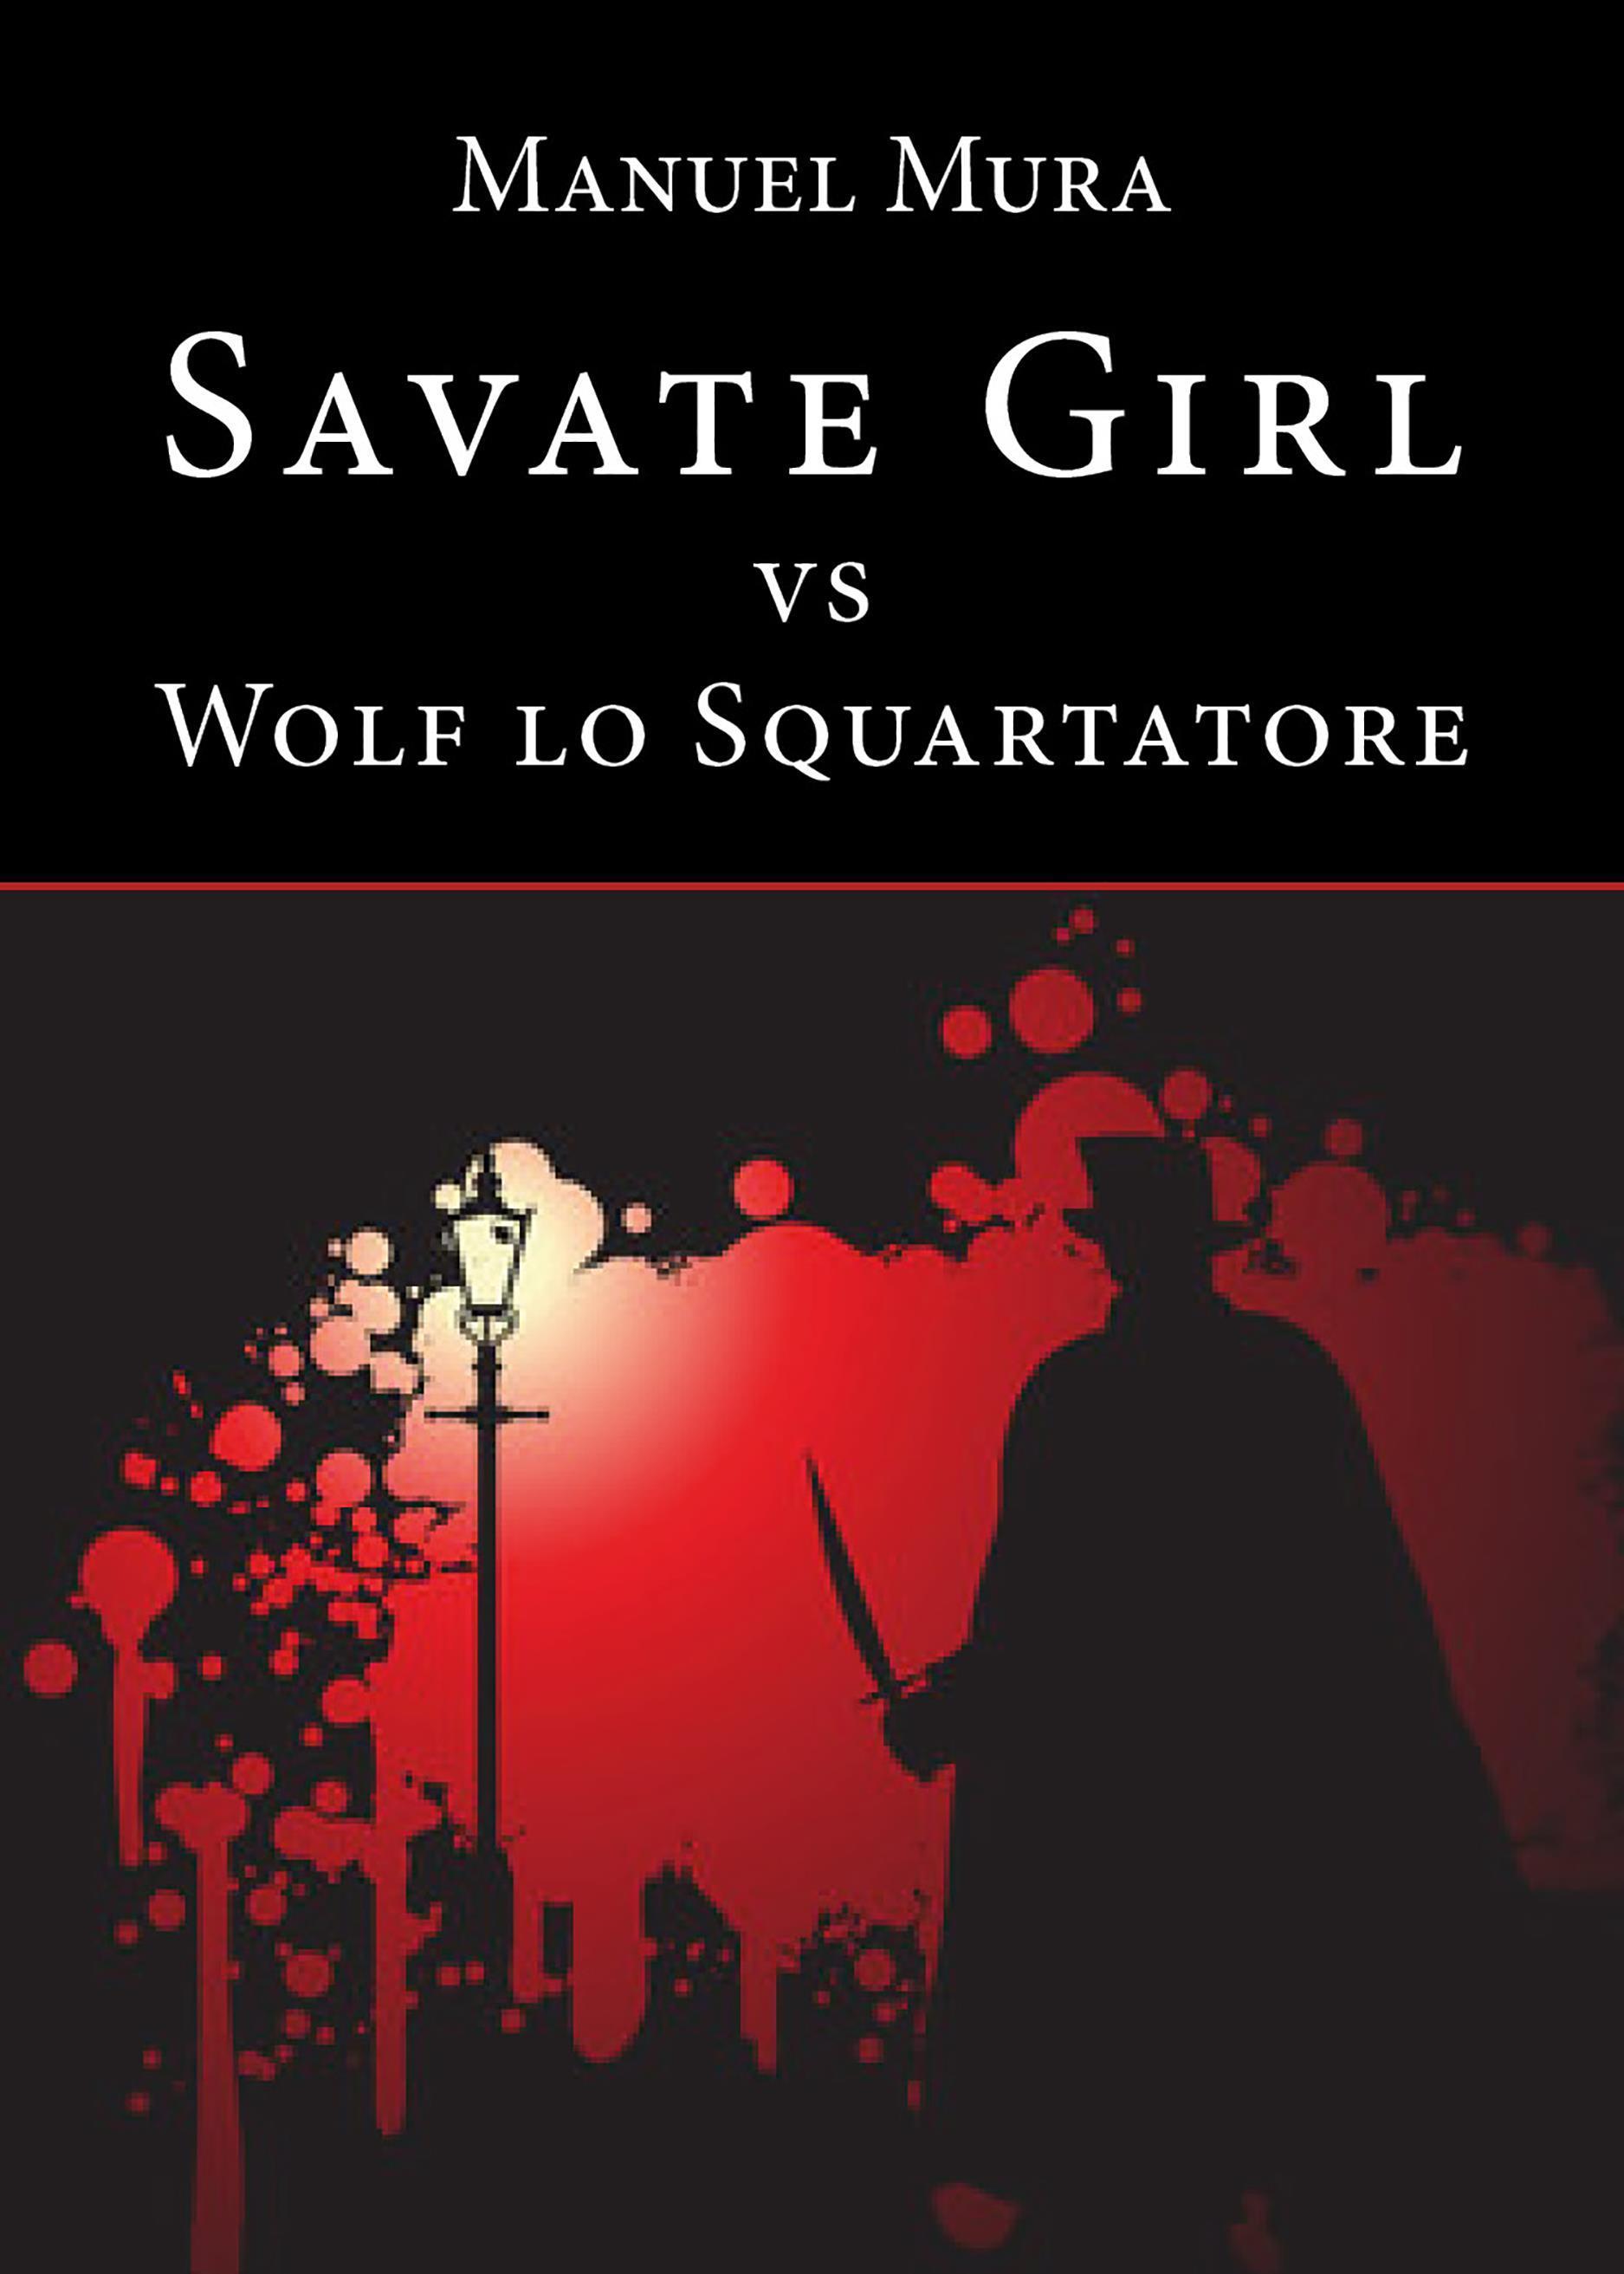 Savate Girl vs Wolf lo Squartatore